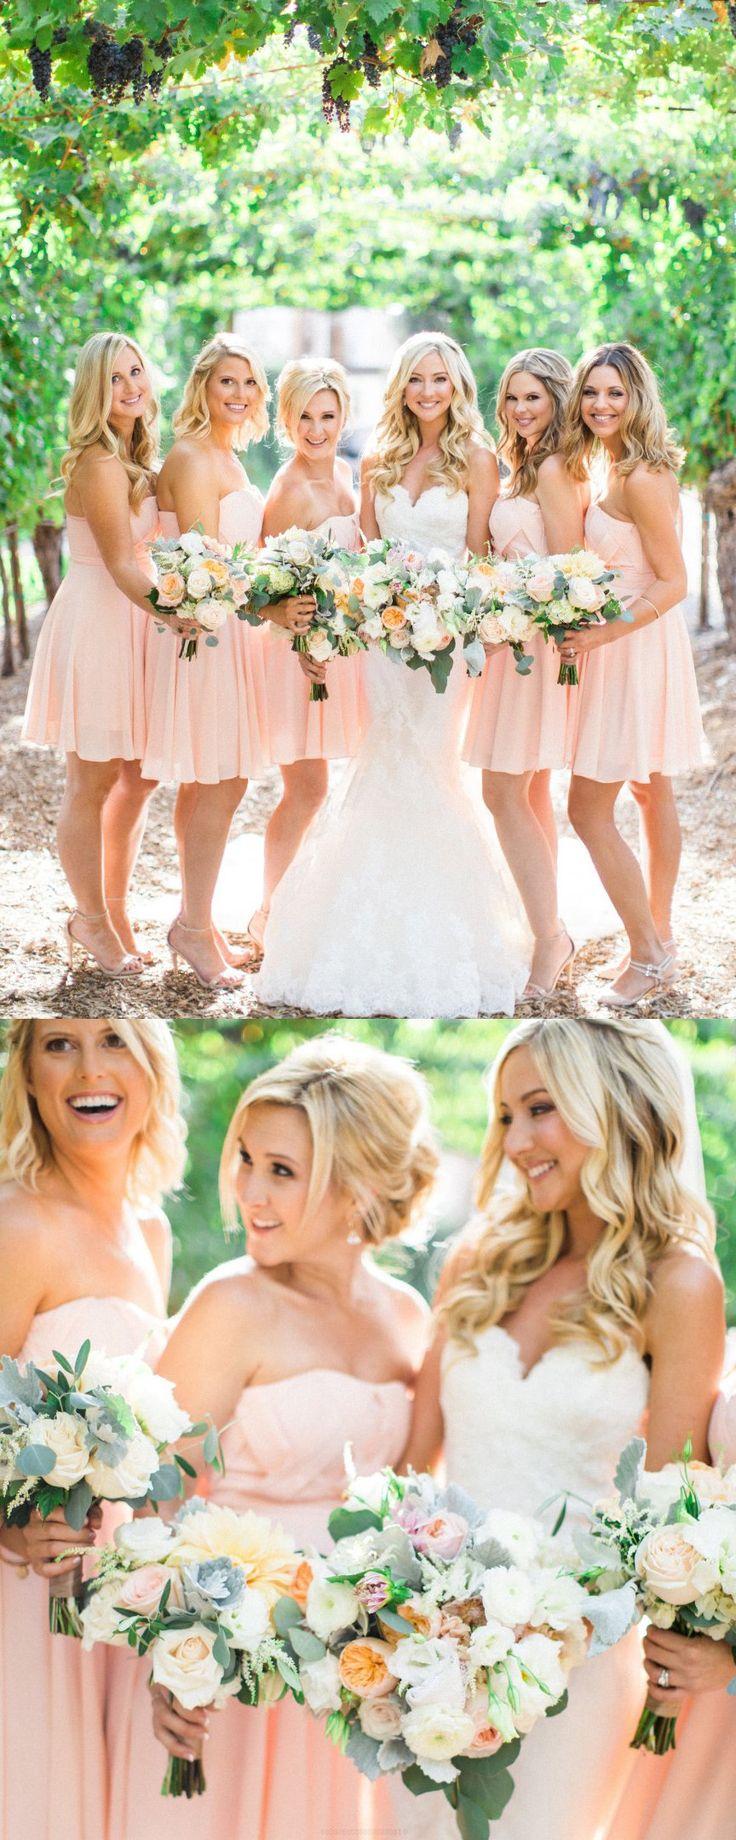 30 best bridesmaid dresses images on pinterest flower girls bridesmaid dresses short pink bridesmaid dresses short bridesmaid dresses bridesmaid dresses cheap ombrellifo Choice Image